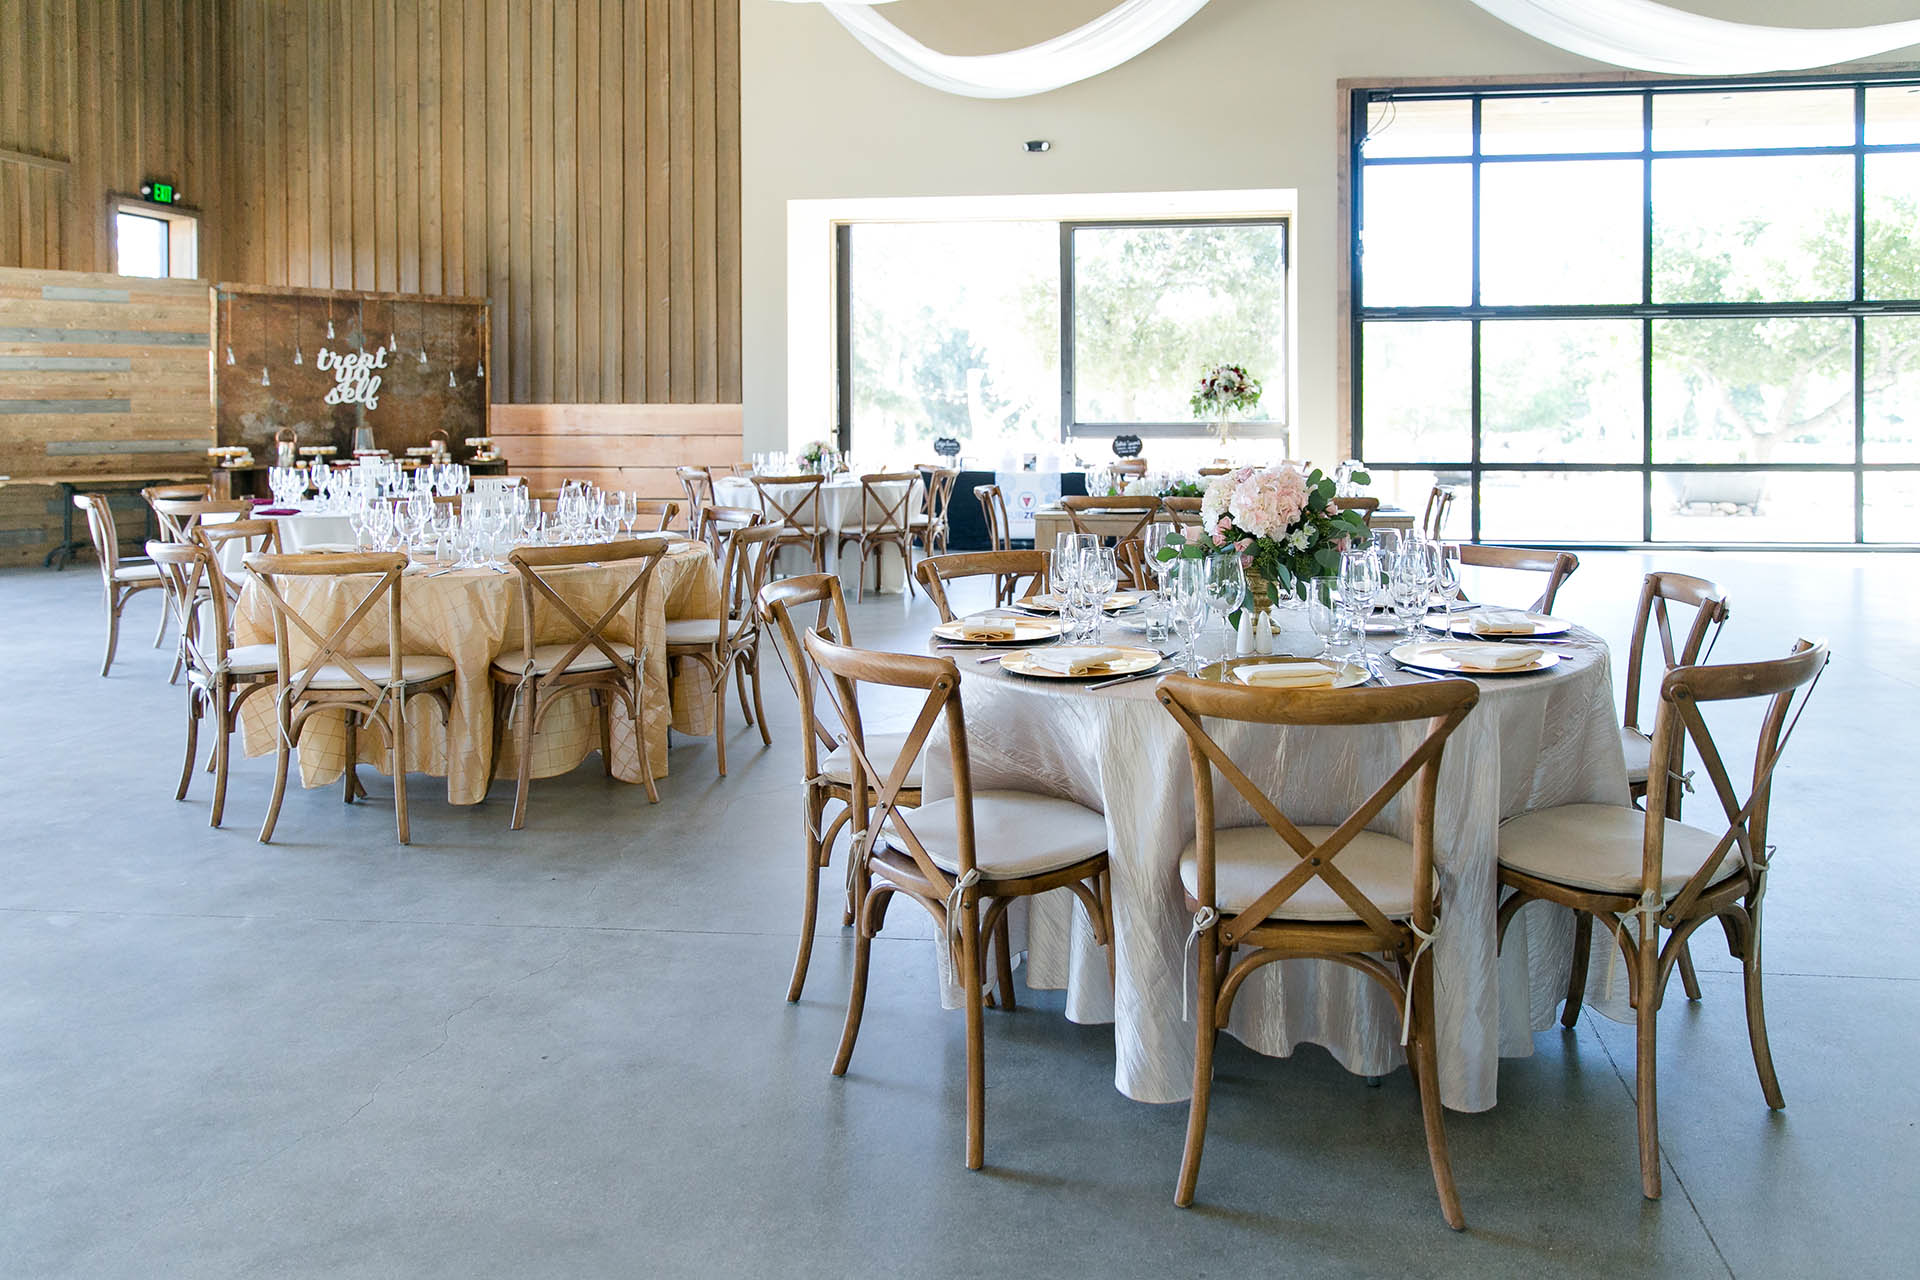 Galway downs wedgewood weddings modern rustic barn wedding venue wedgewood weddings galway downs temecula california junglespirit Image collections